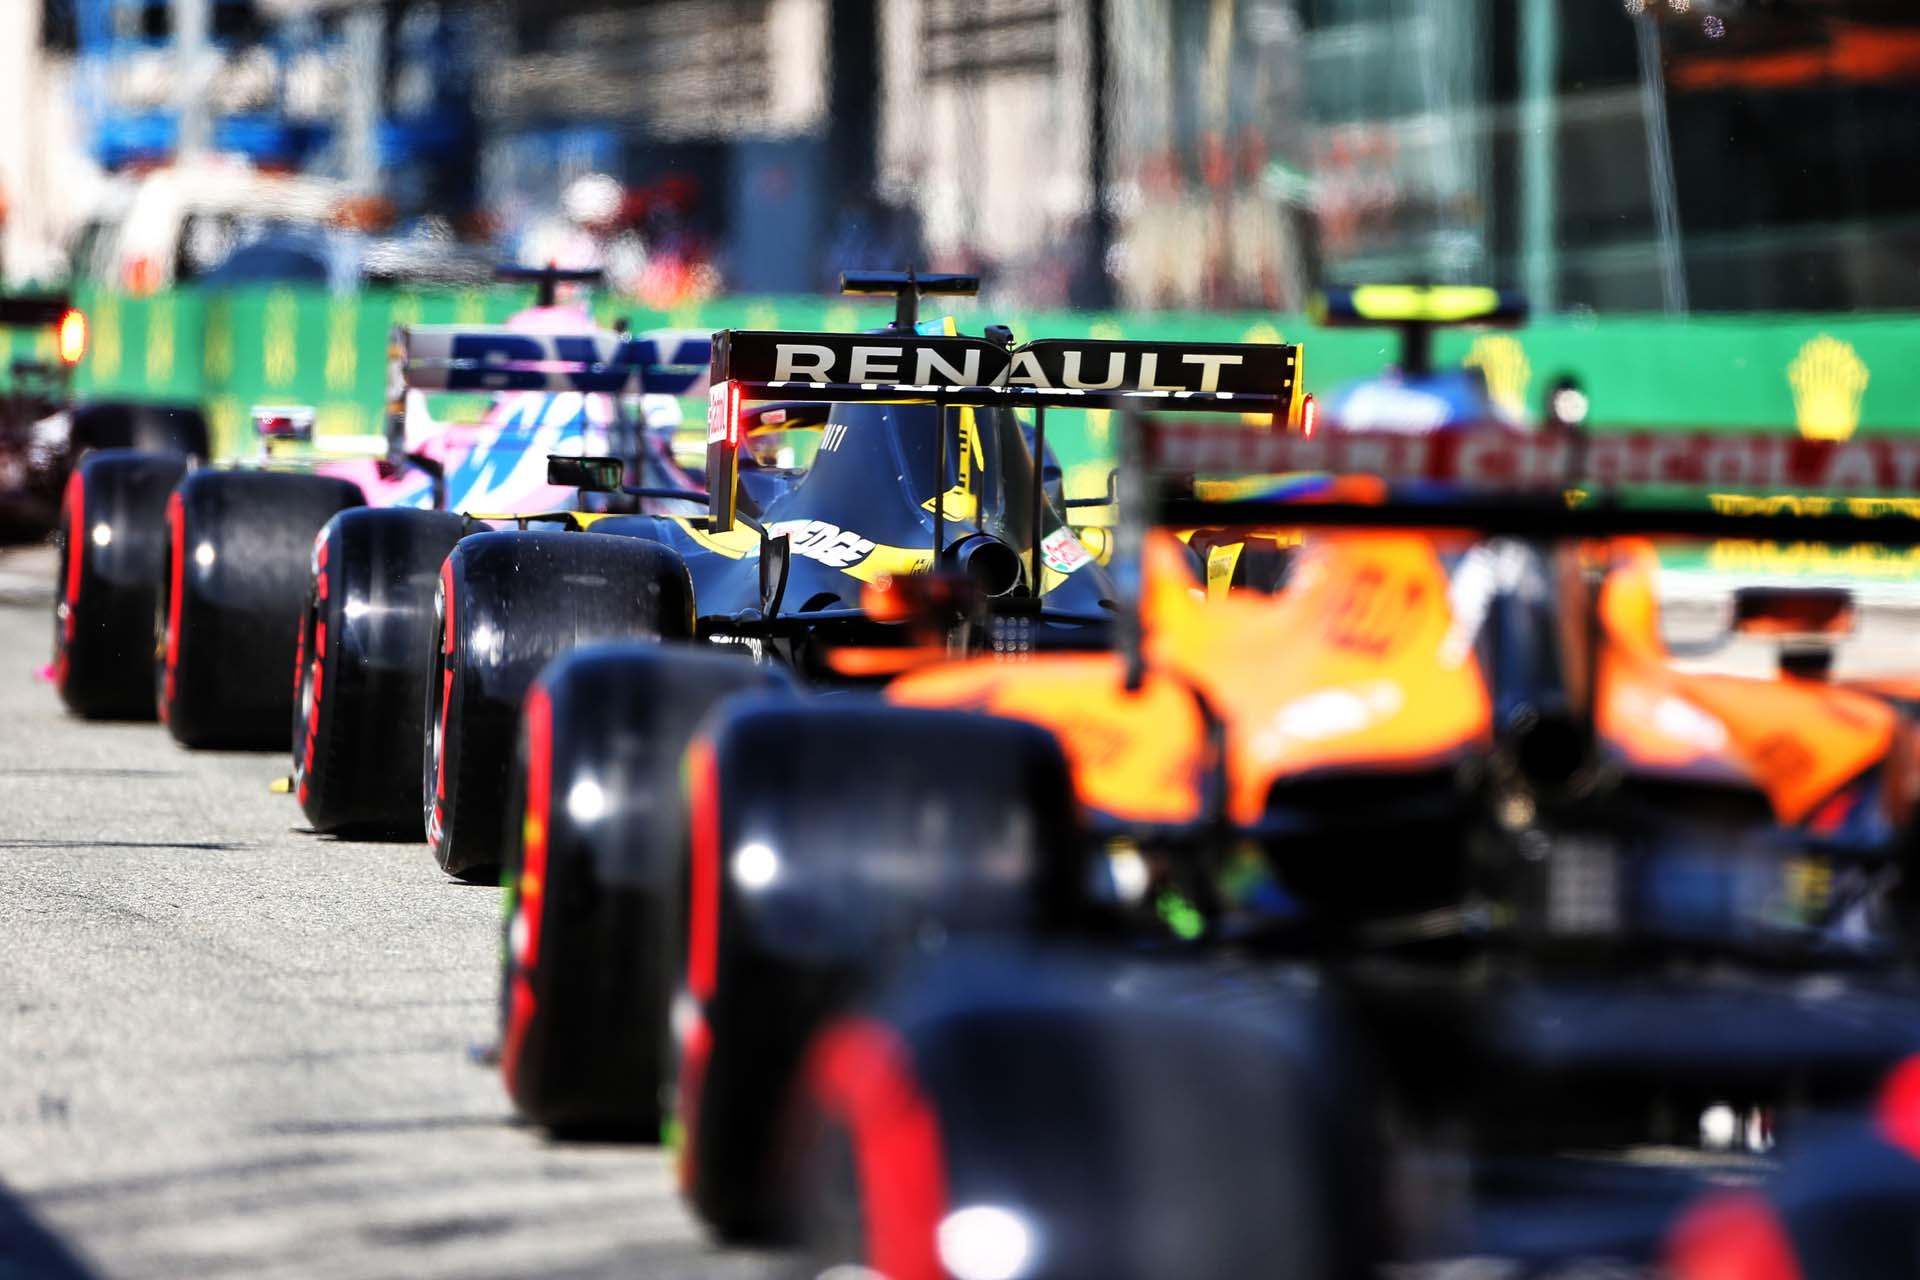 Motor Racing - Formula One World Championship - Italian Grand Prix - Qualifying Day - Monza, Italy